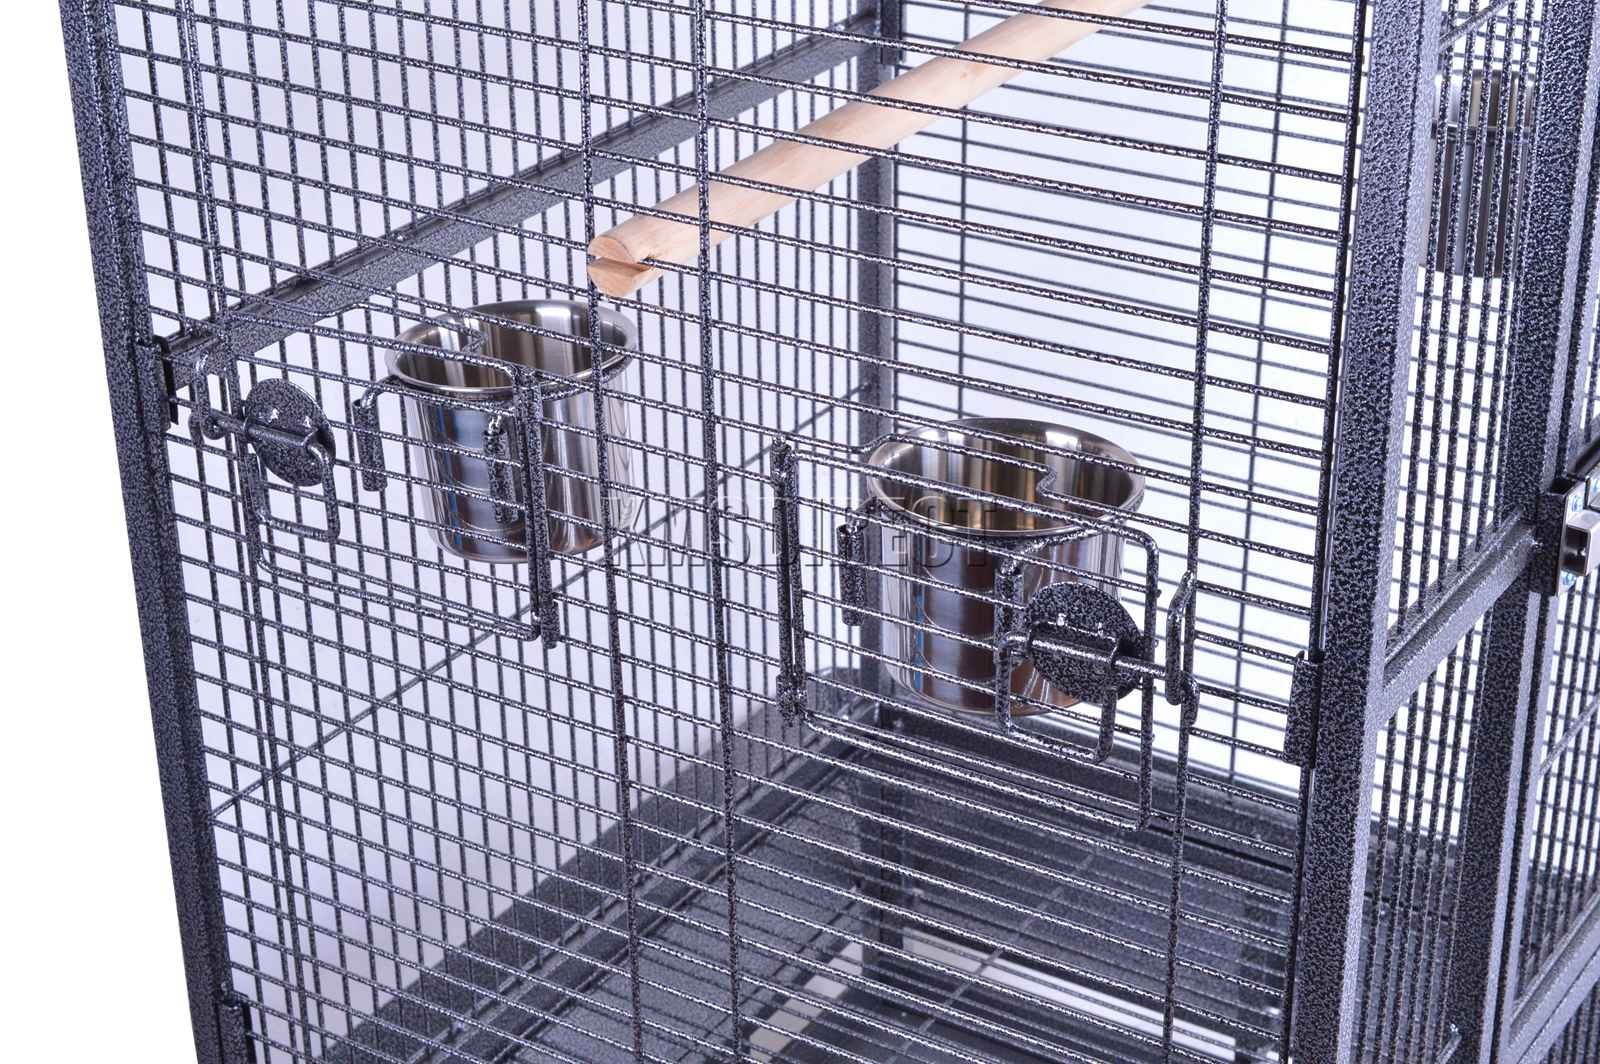 121998112507 2475 I 225 26 BIRD CAGE METAL MBC 01 HAMMERED SILVER KMSWM0707 - Foxhunter Grande Metal Jaula con Soporte Pajarera Loro Periquito Canario Cacatua